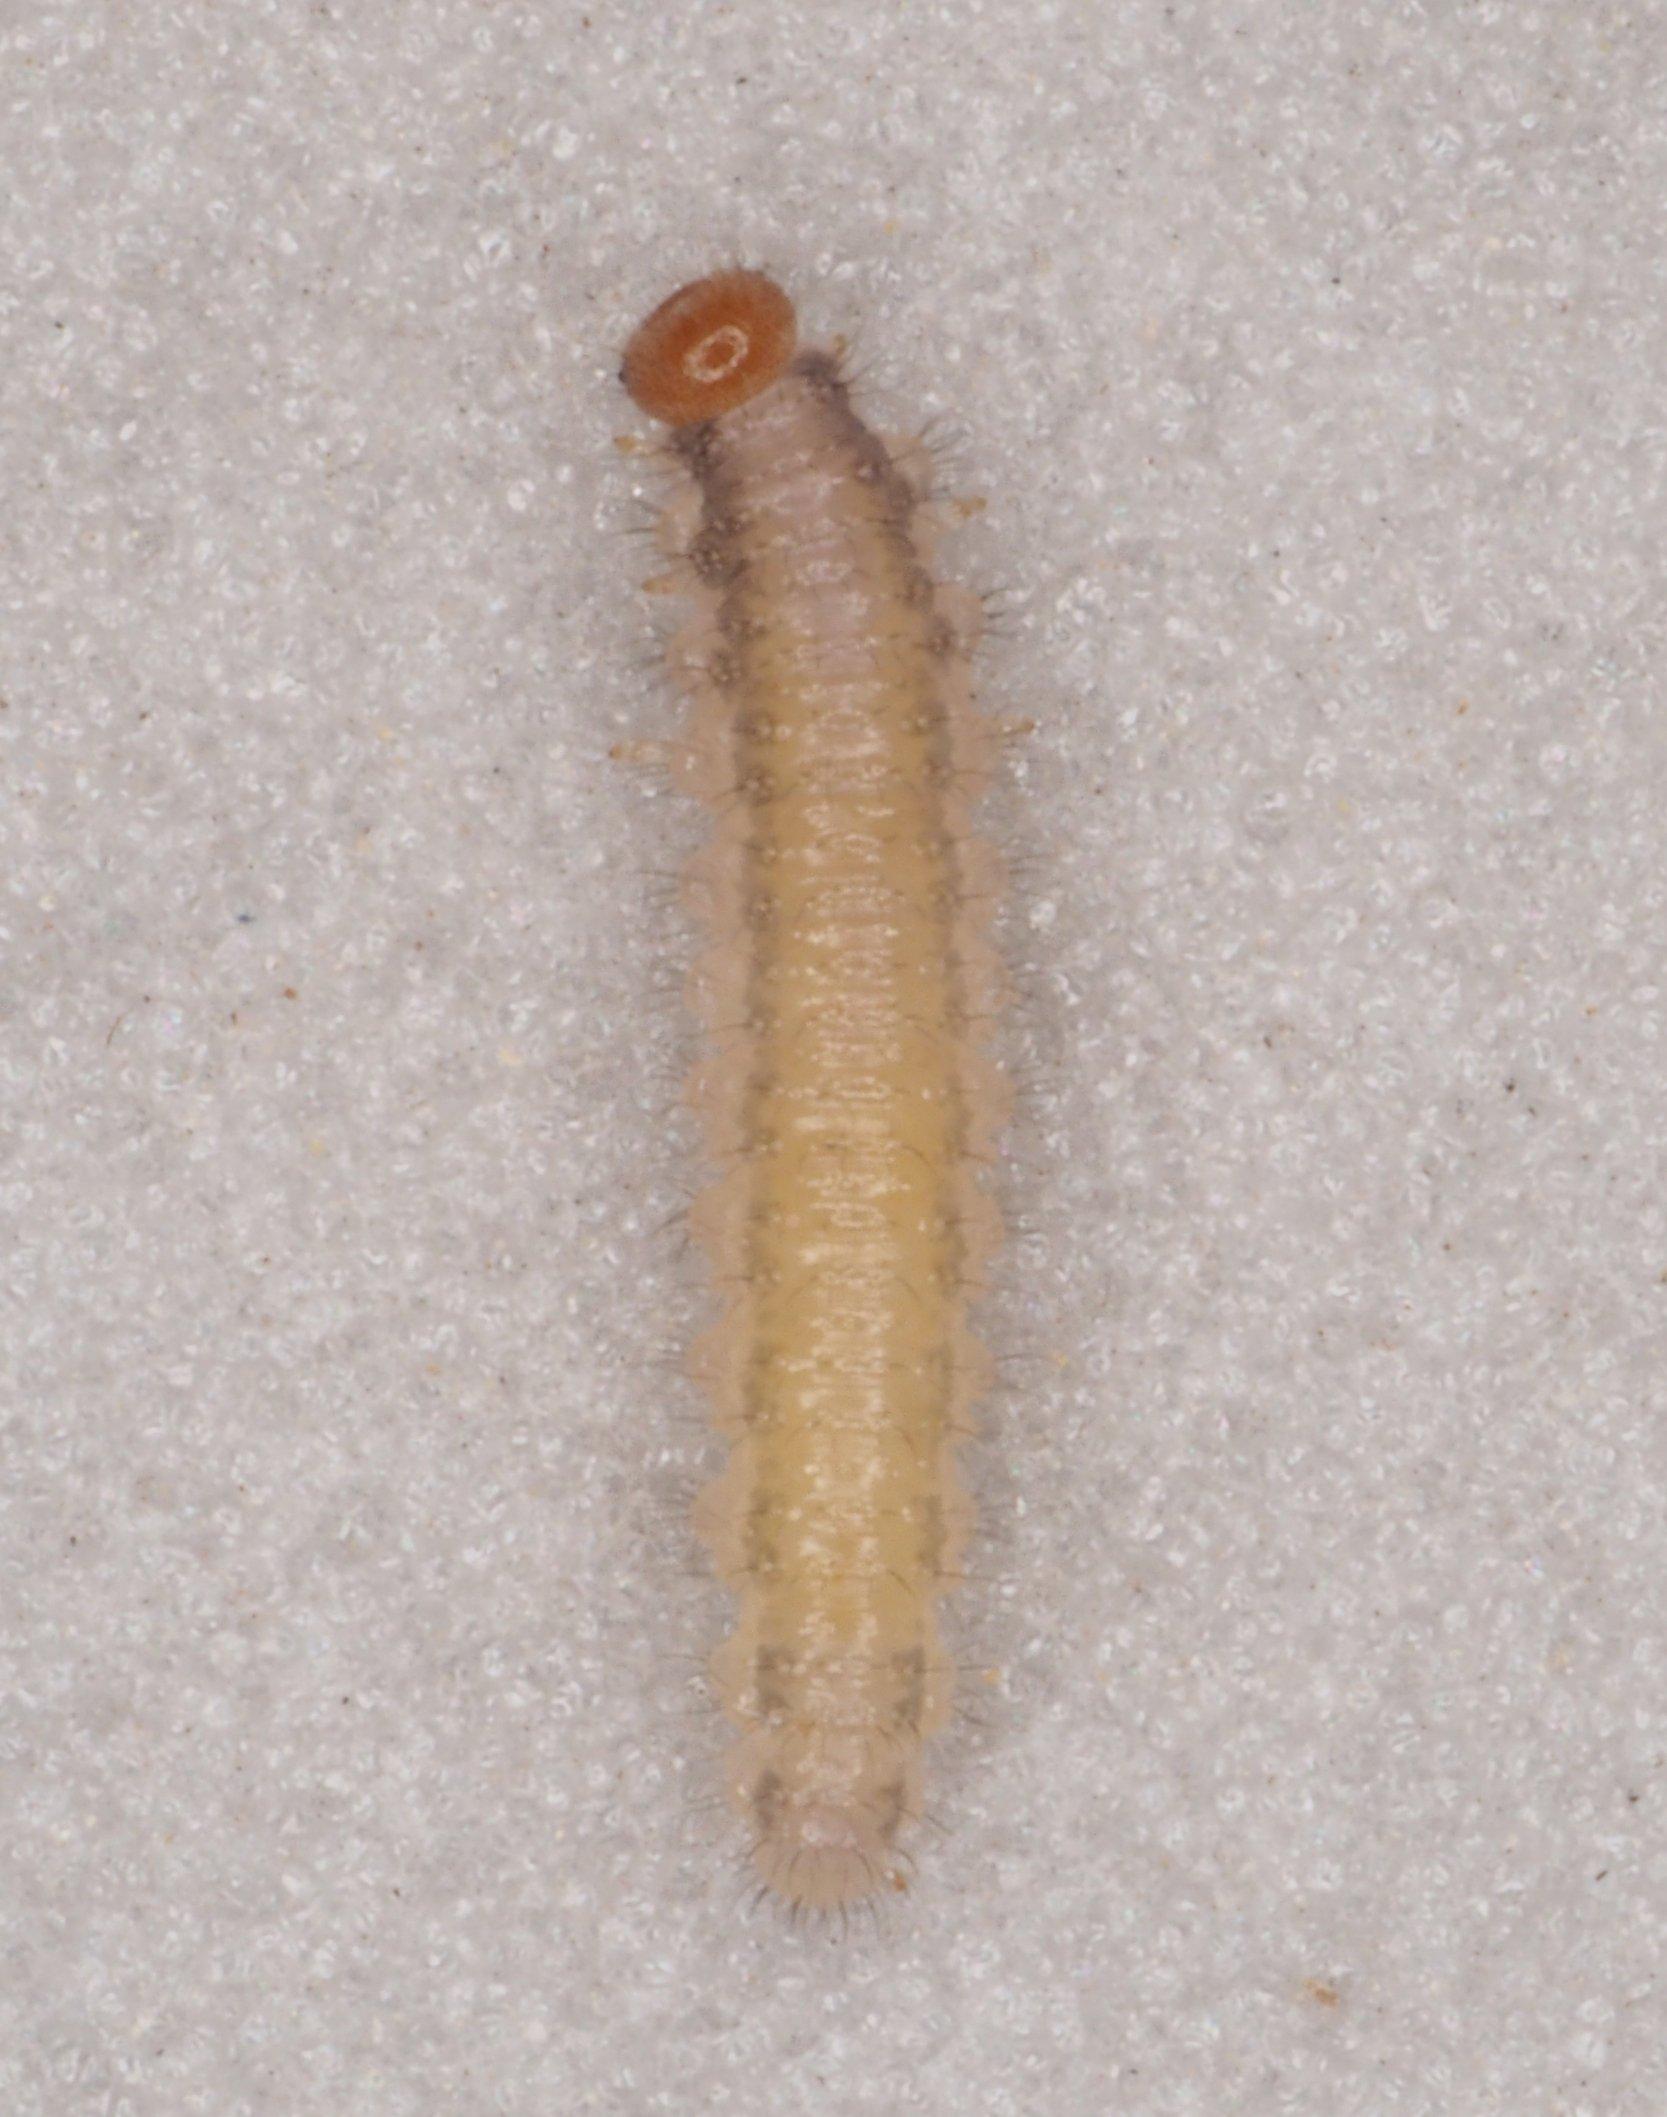 Cladius pectinicornis final instar larva Credit Andrew Green